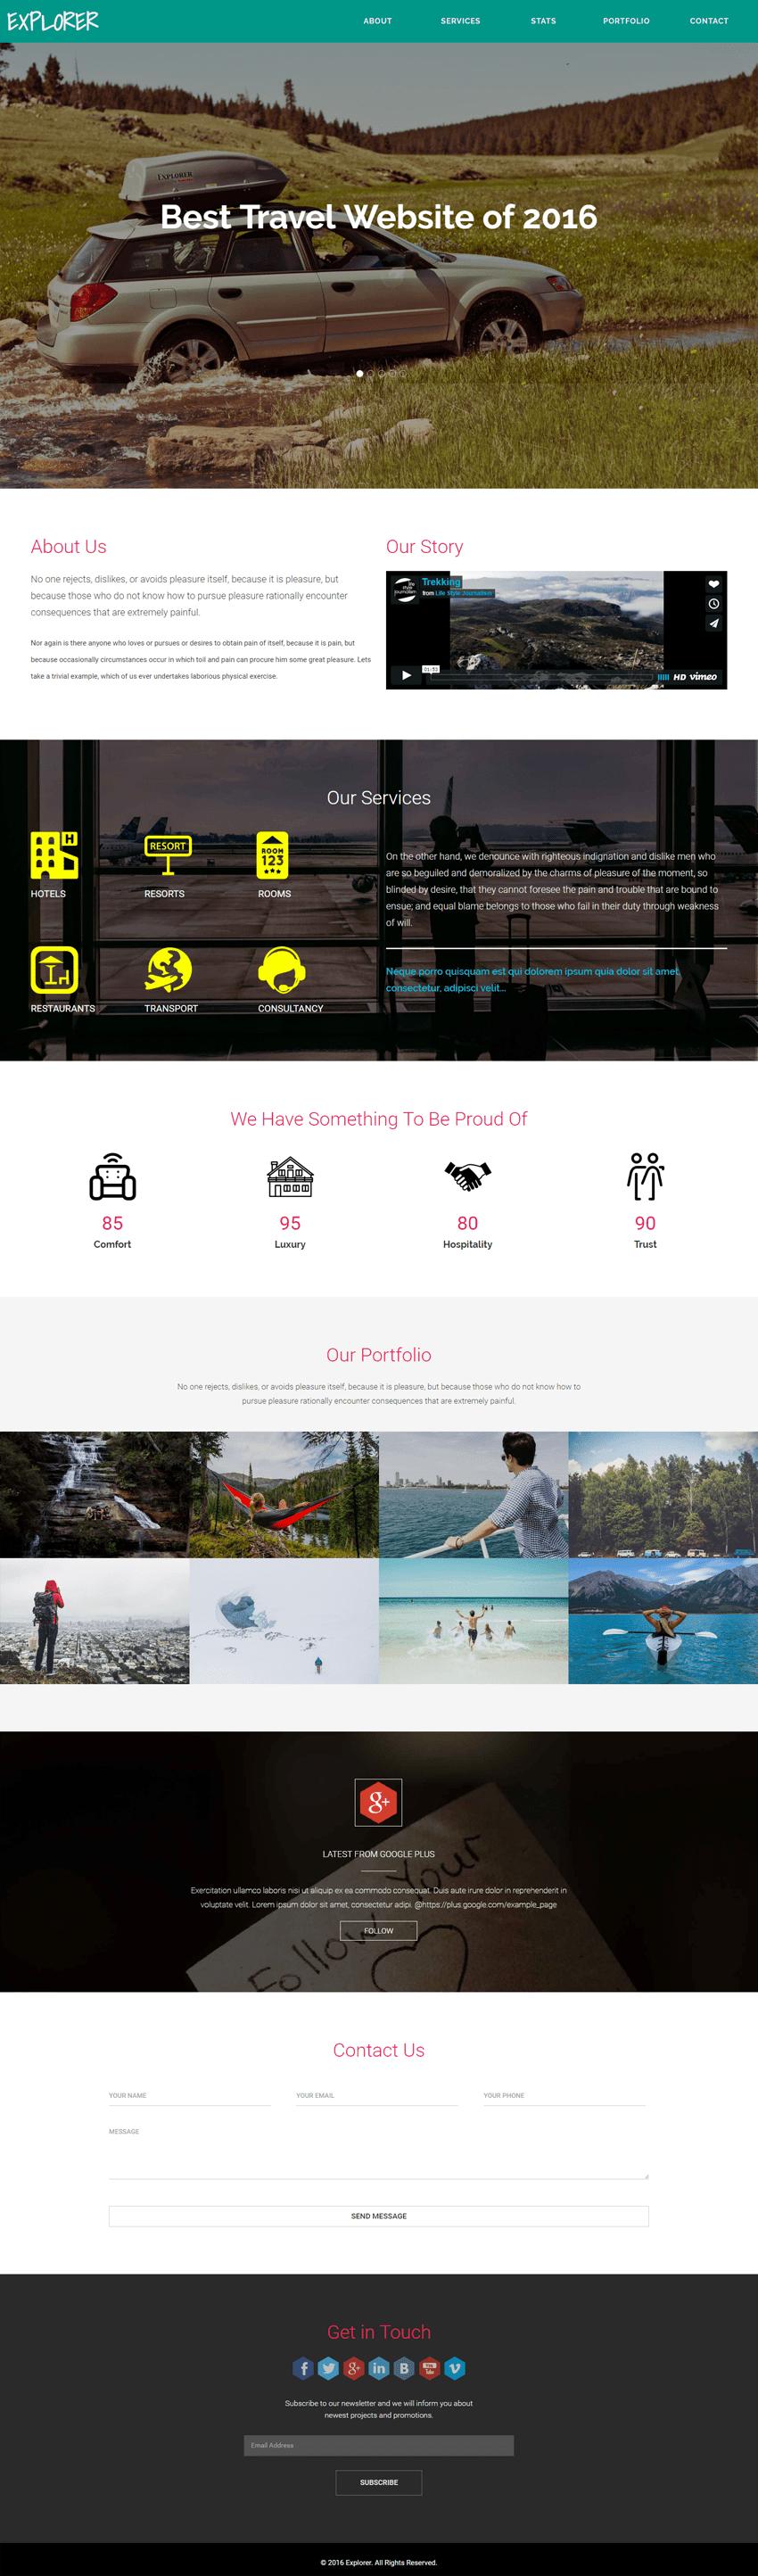 Explorer a Travel Category Flat Bootstrap Responsive Web